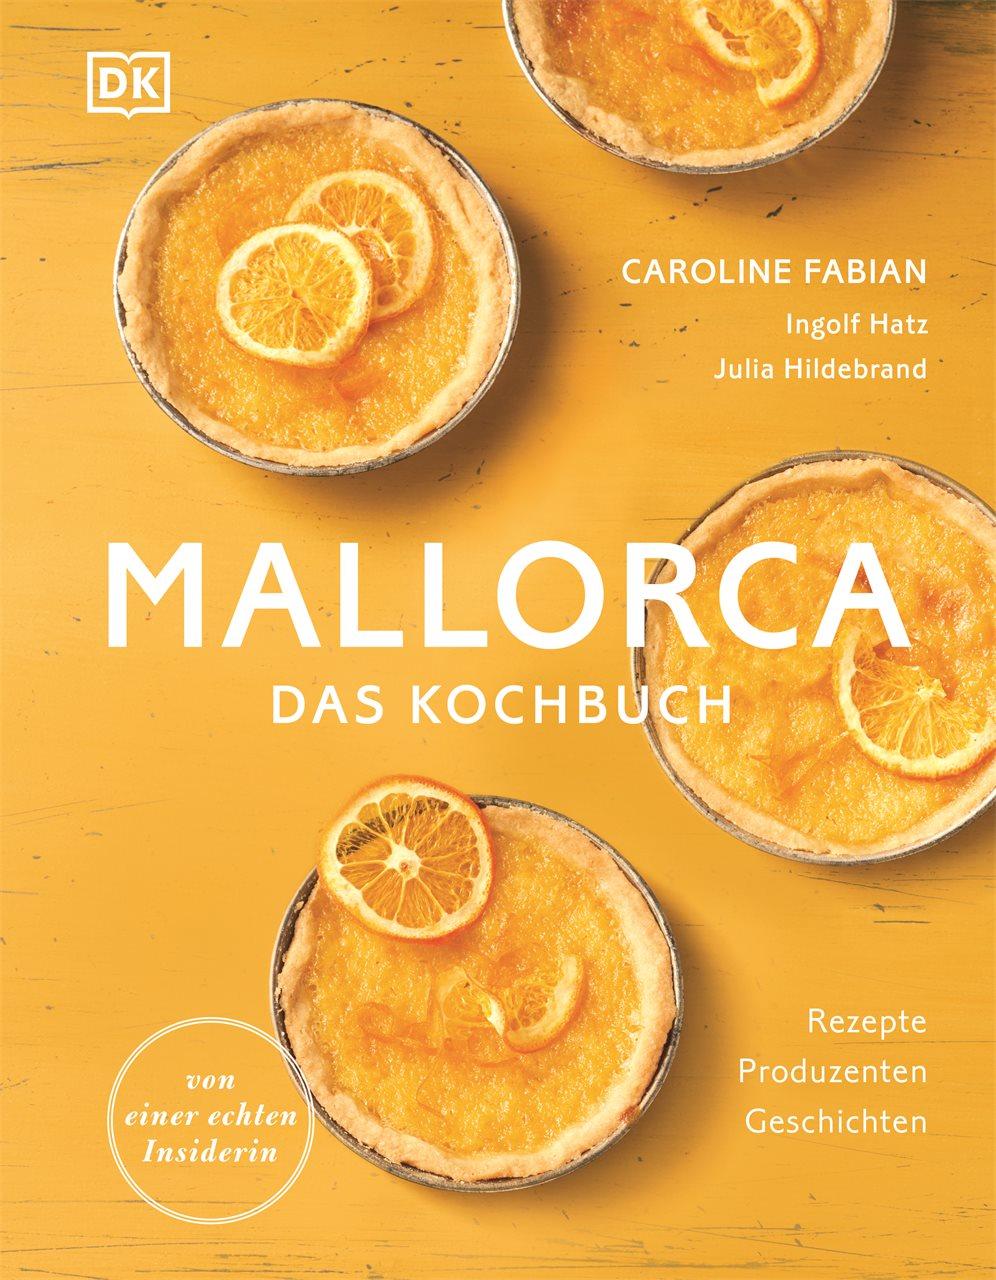 DK Mallorca das Kochbuch Caroline Fabian